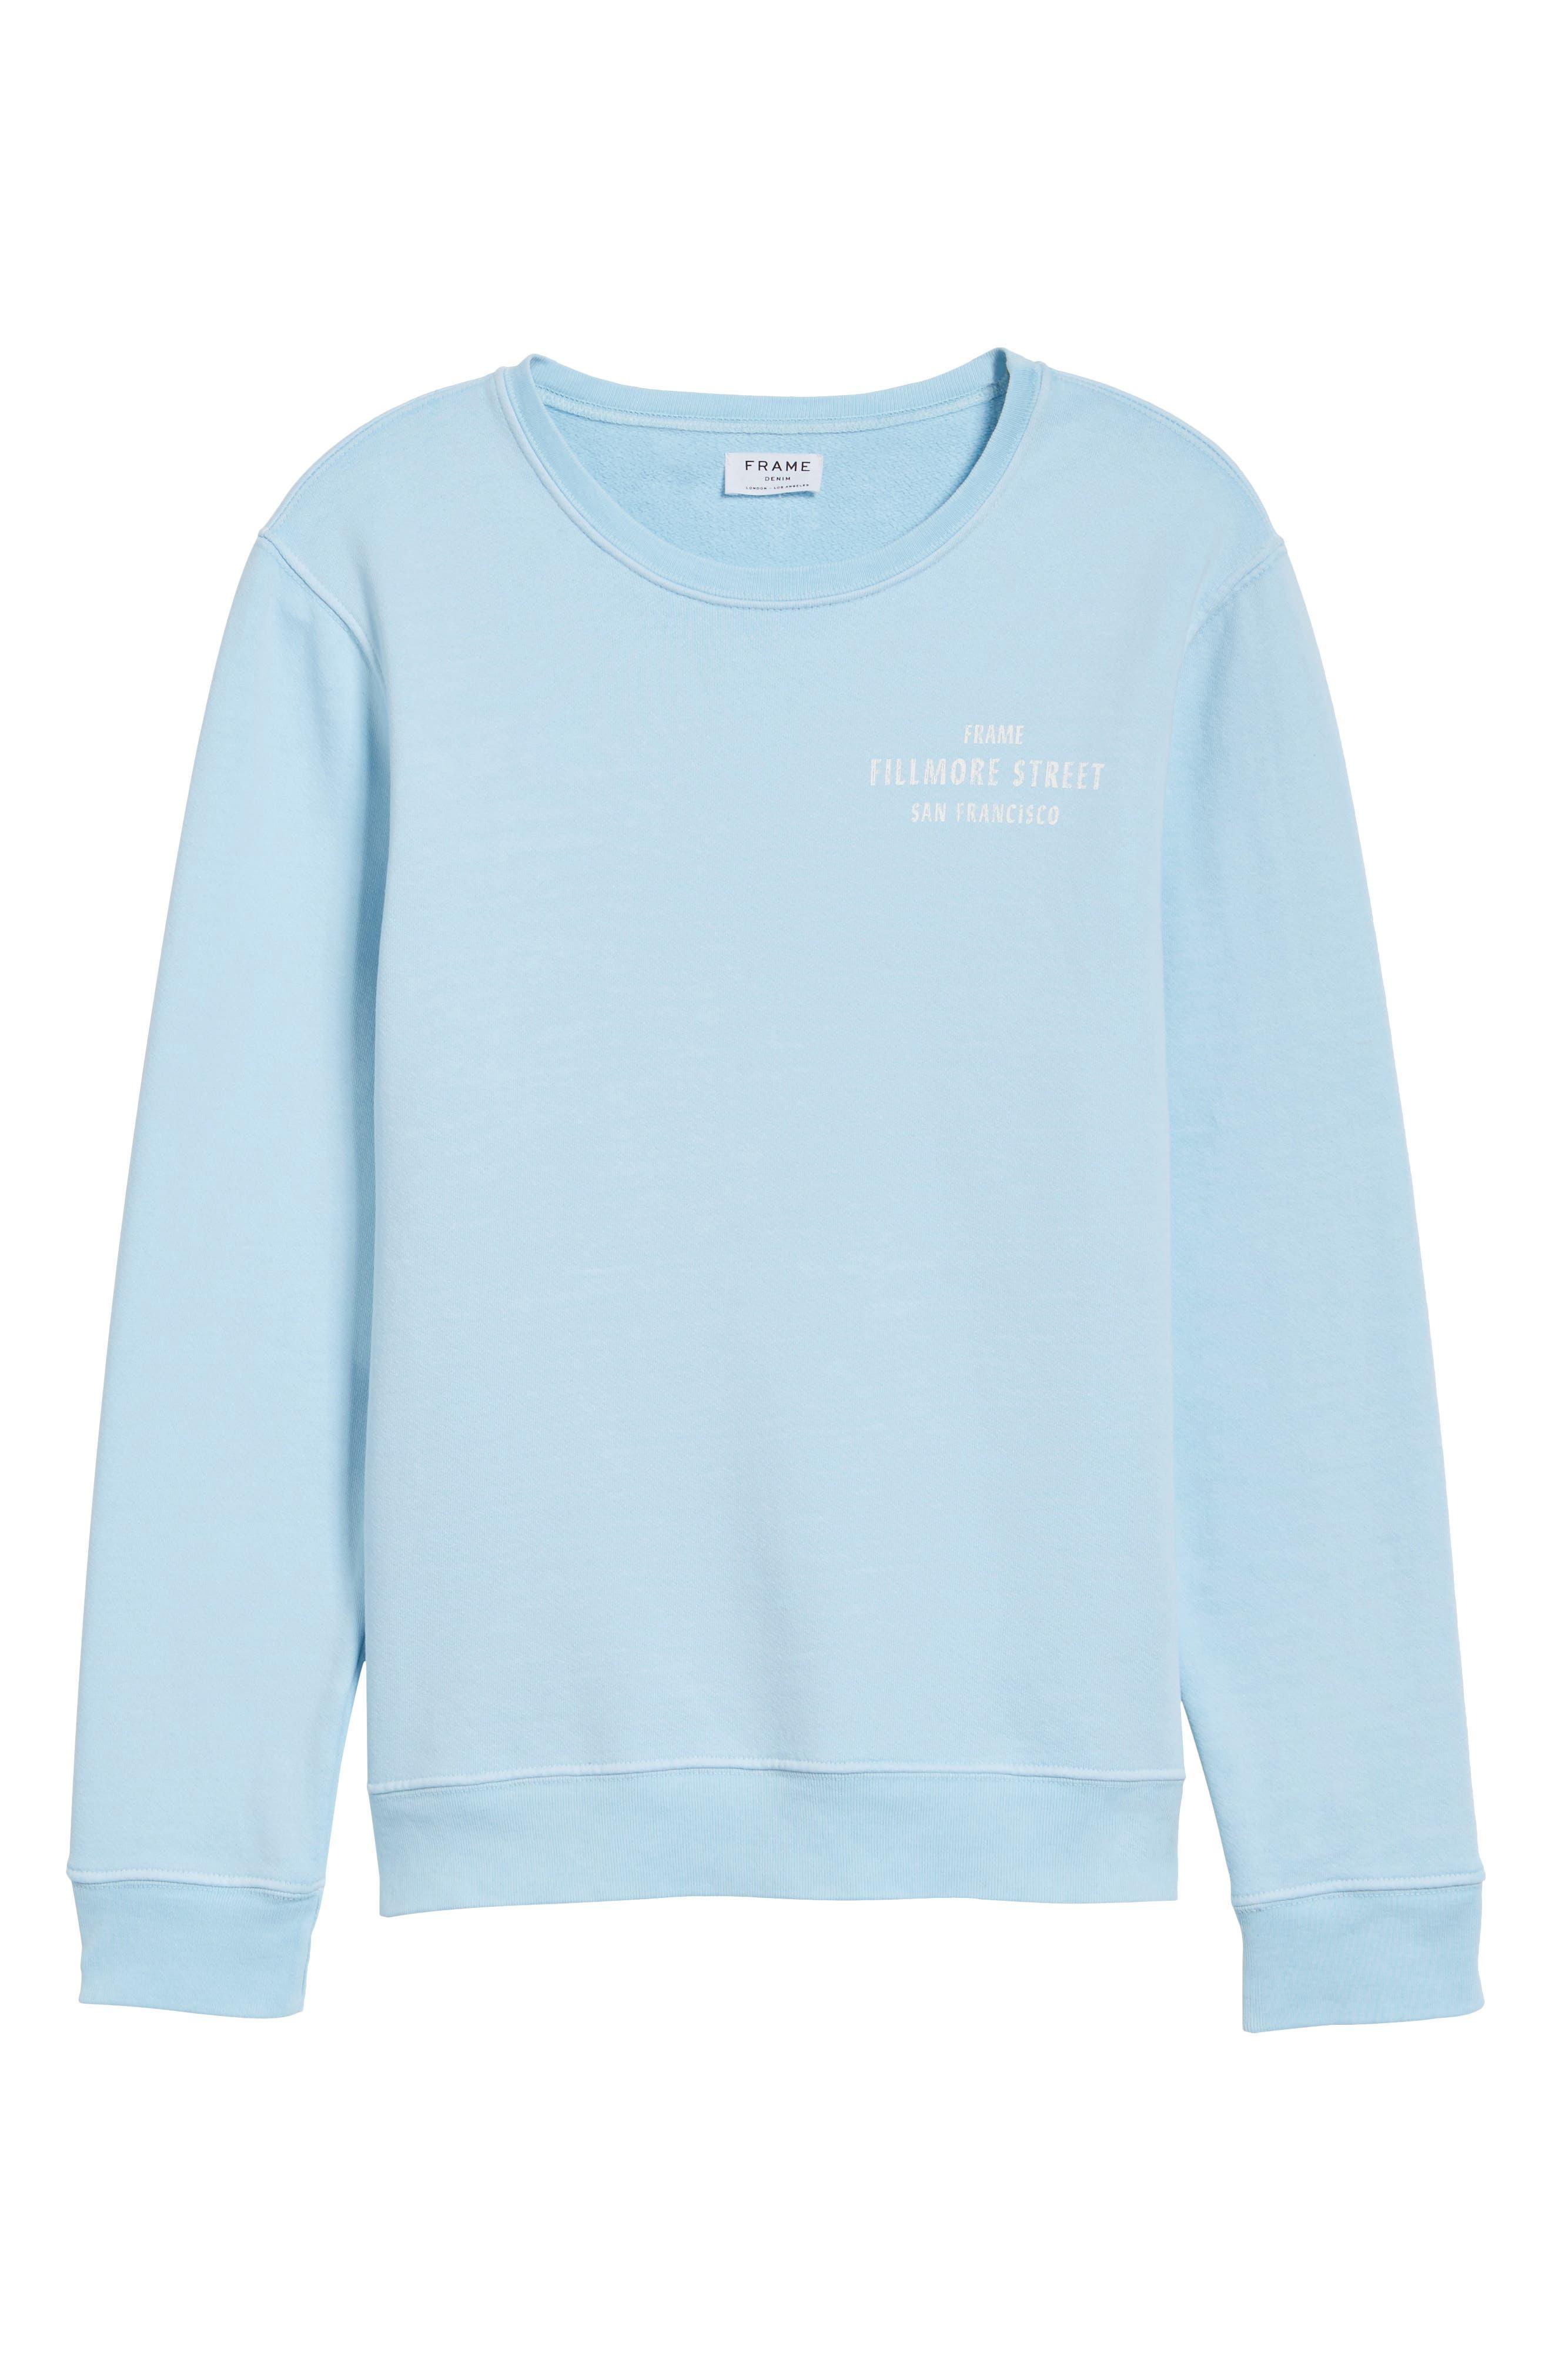 Vintage Crewneck Sweatshirt,                             Alternate thumbnail 6, color,                             400